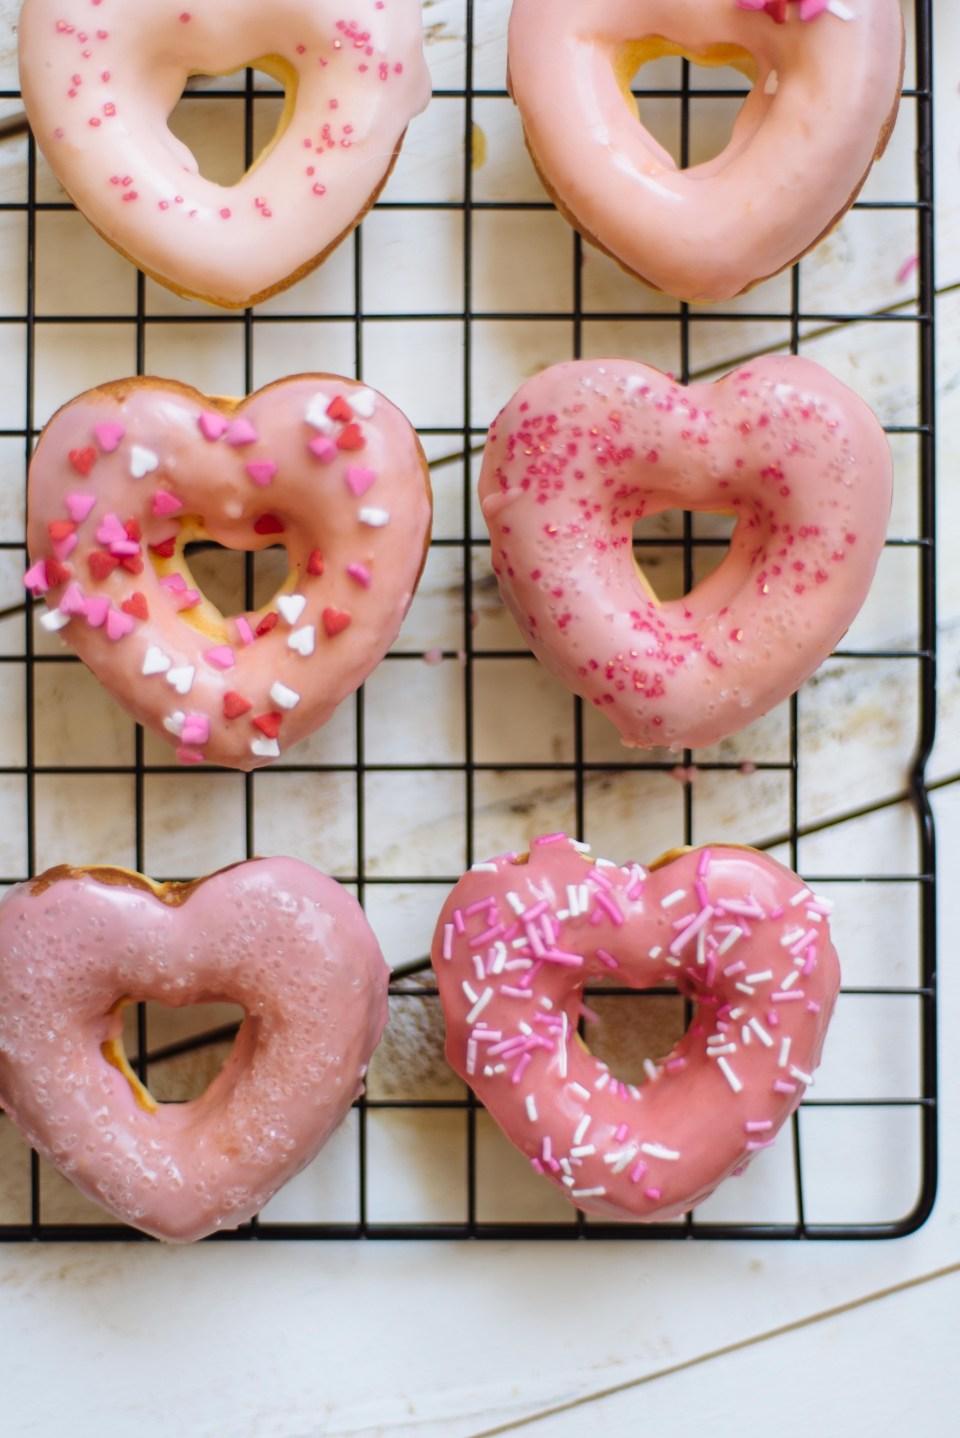 Baked Donut Recipe | Valentine's Day Donuts | Valentine's Day Desserts | Heart Shaped Donuts